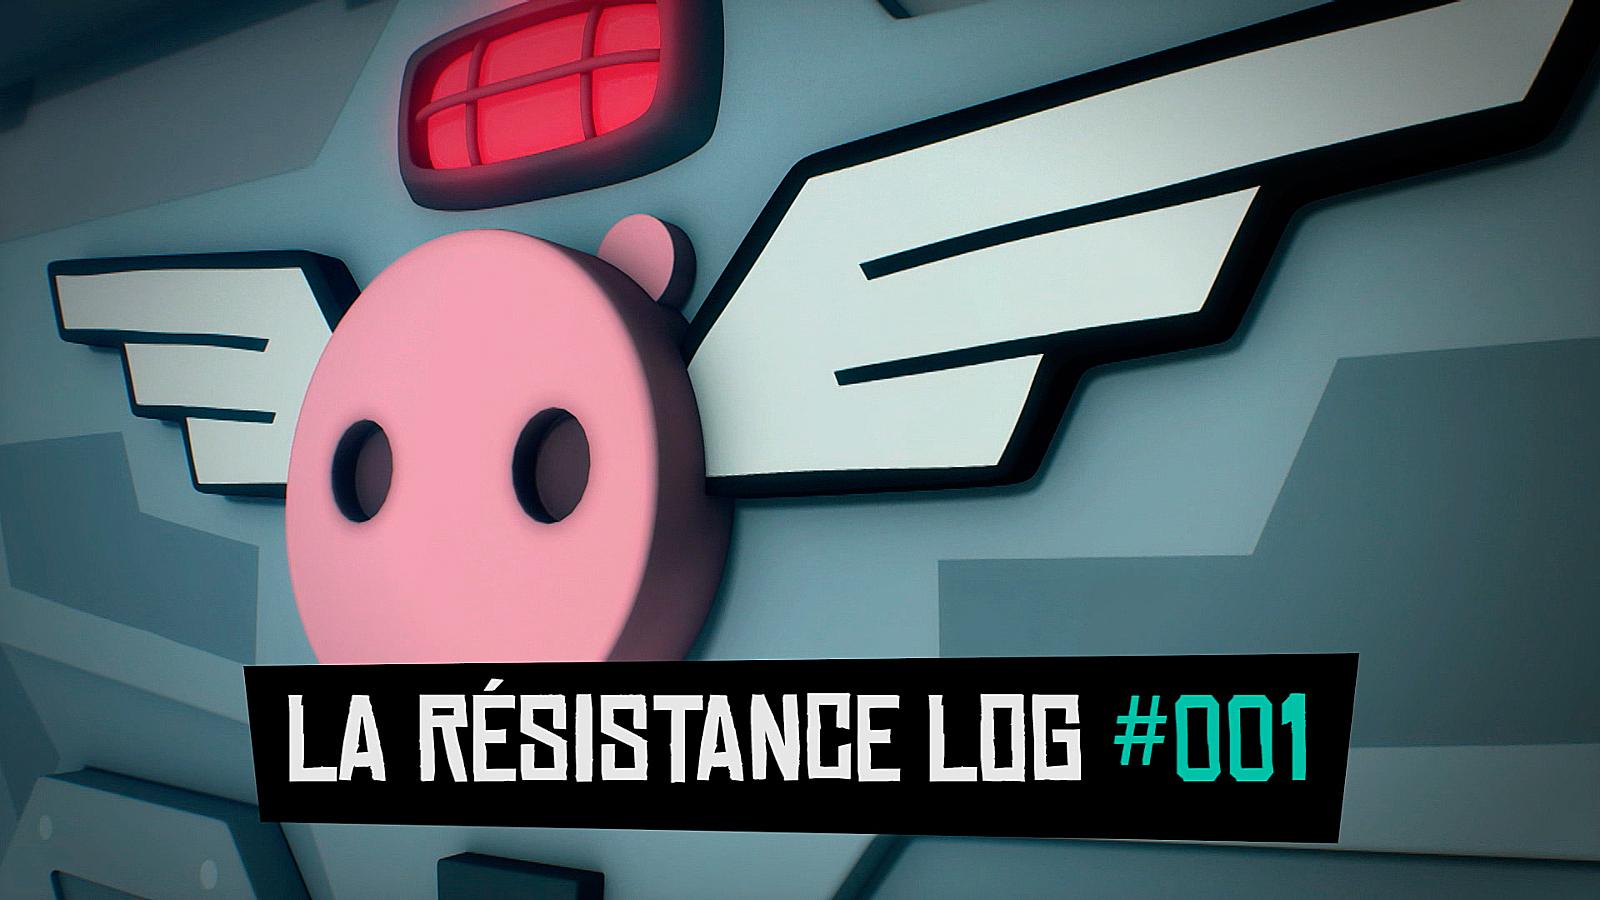 Temporada 1 La Résistance log #001